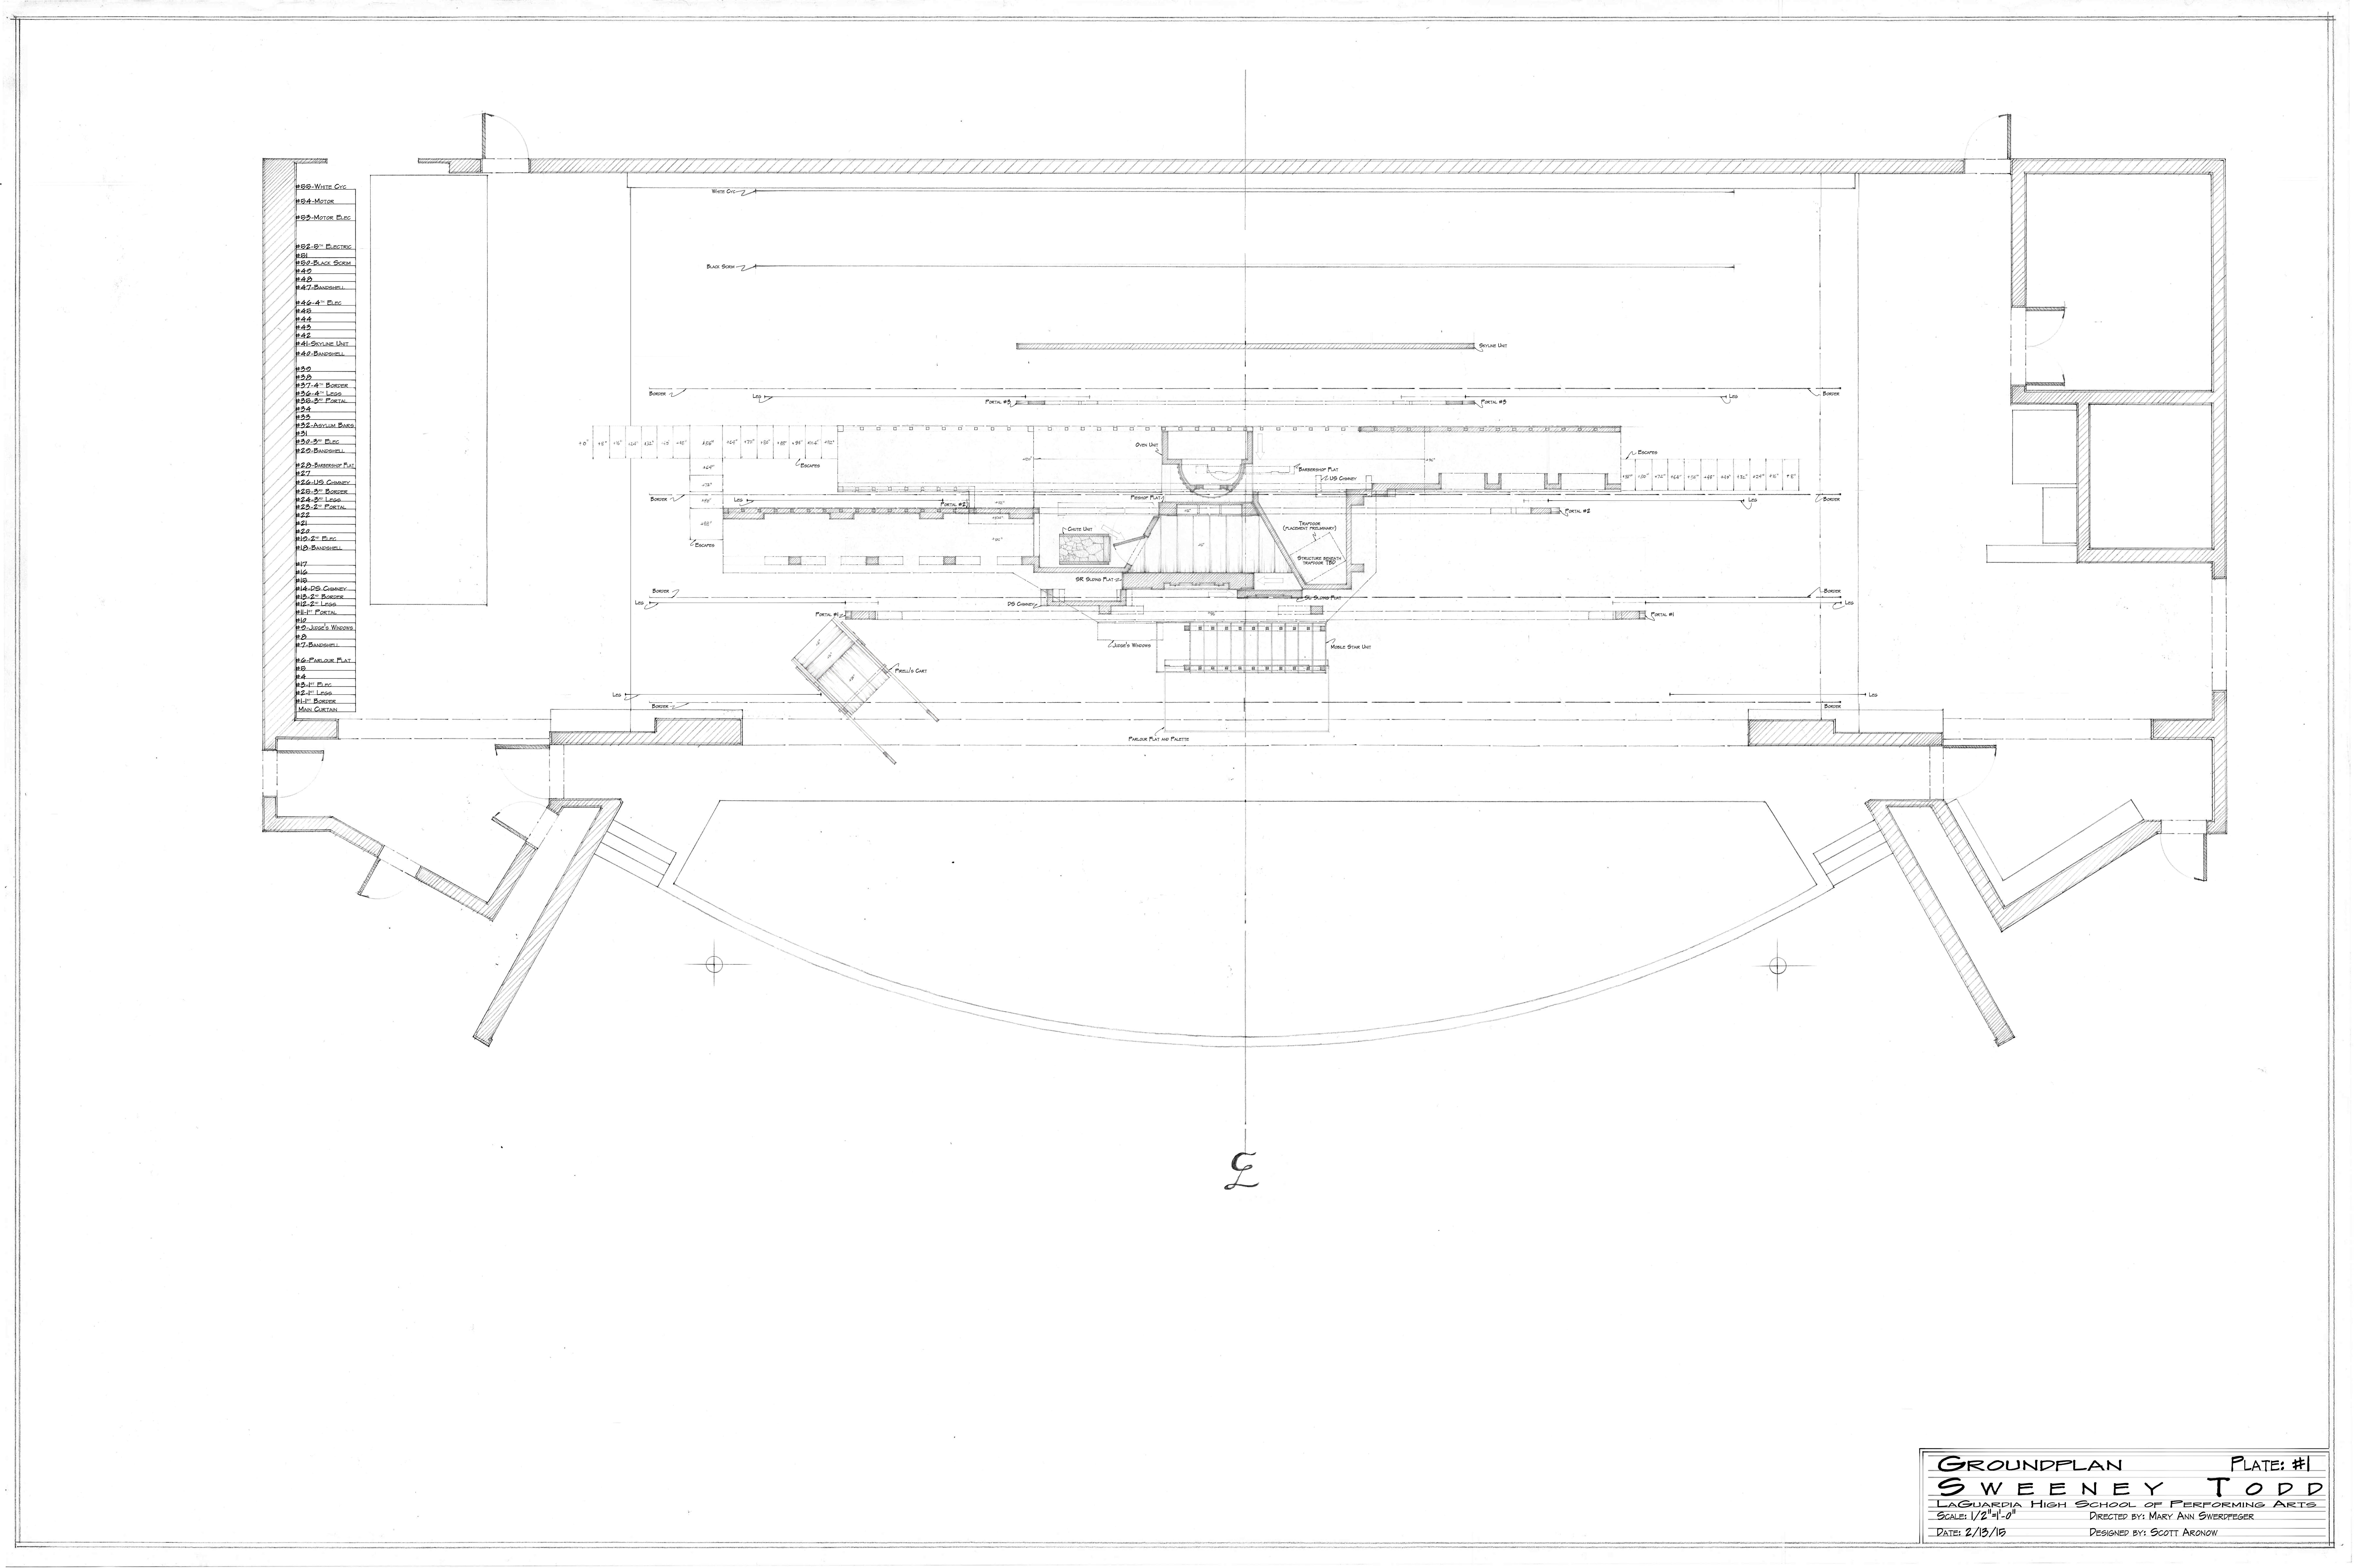 Plate #1. Groundplan